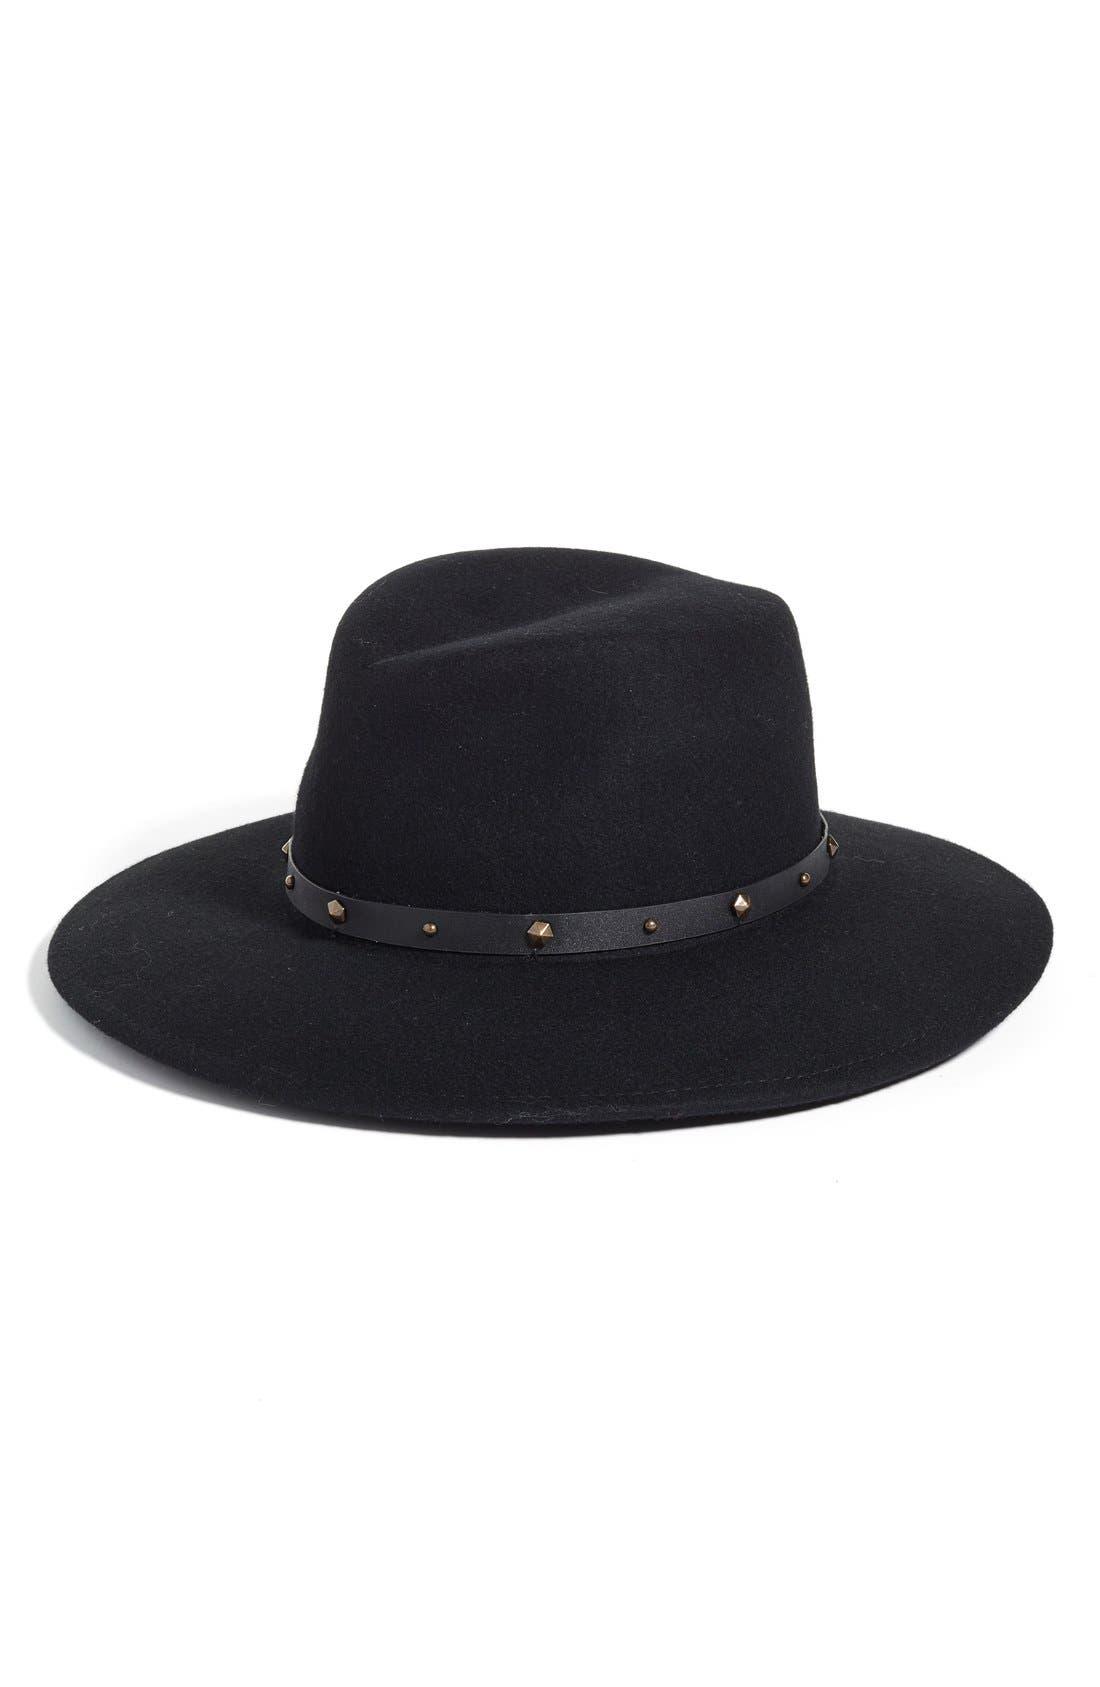 Main Image - Eric Javits Karli Wool Felt Wide Brim Hat